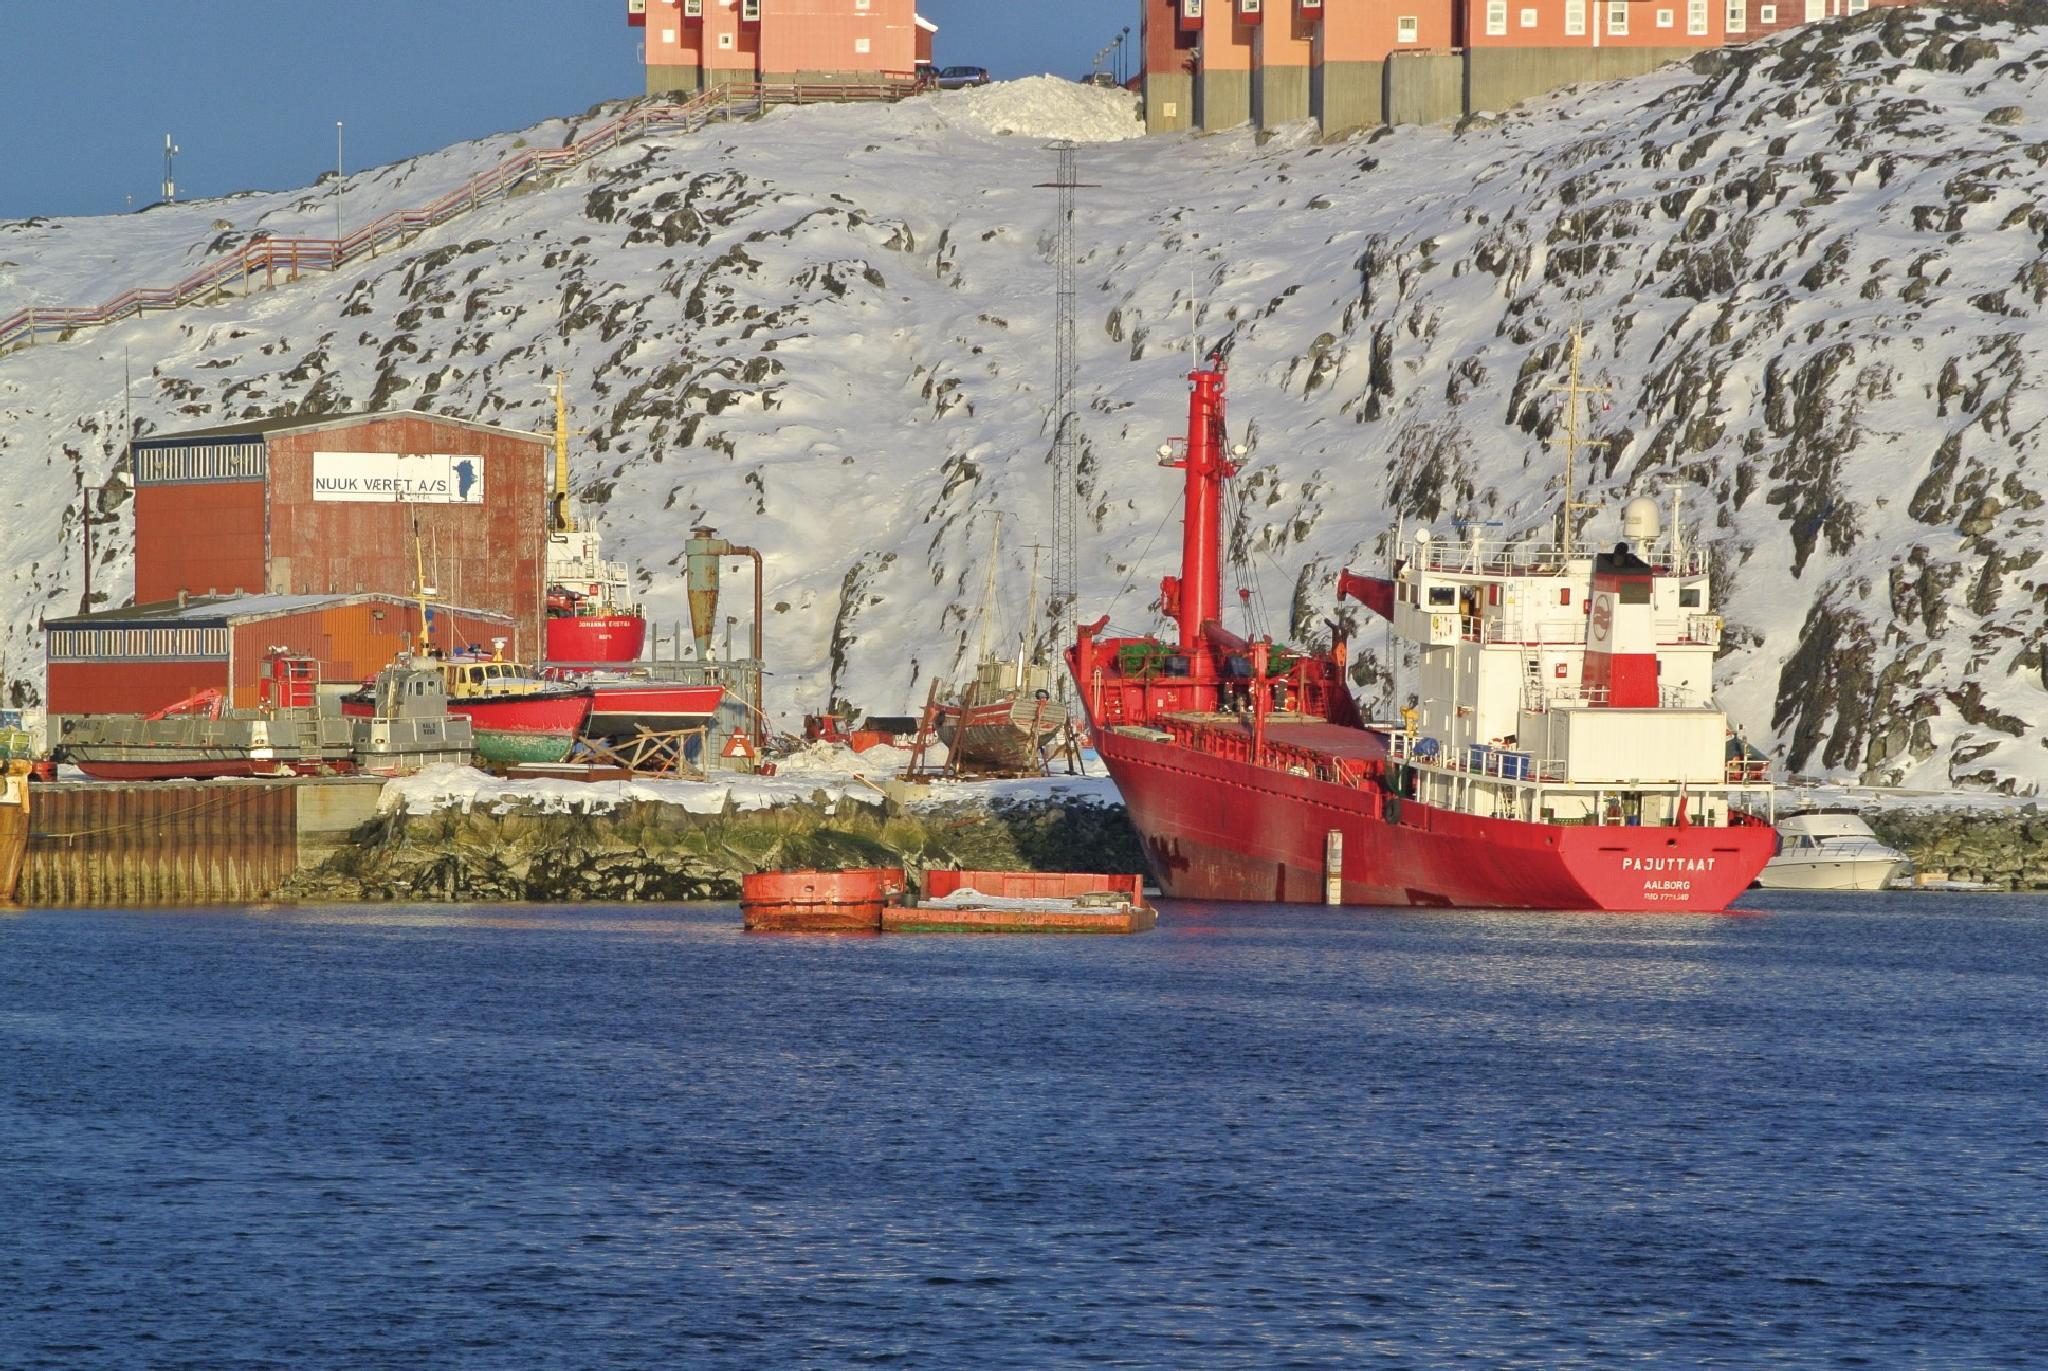 Nuuk shipsyard, service and repair.Nuuk værft. by Tom Augo Lynge